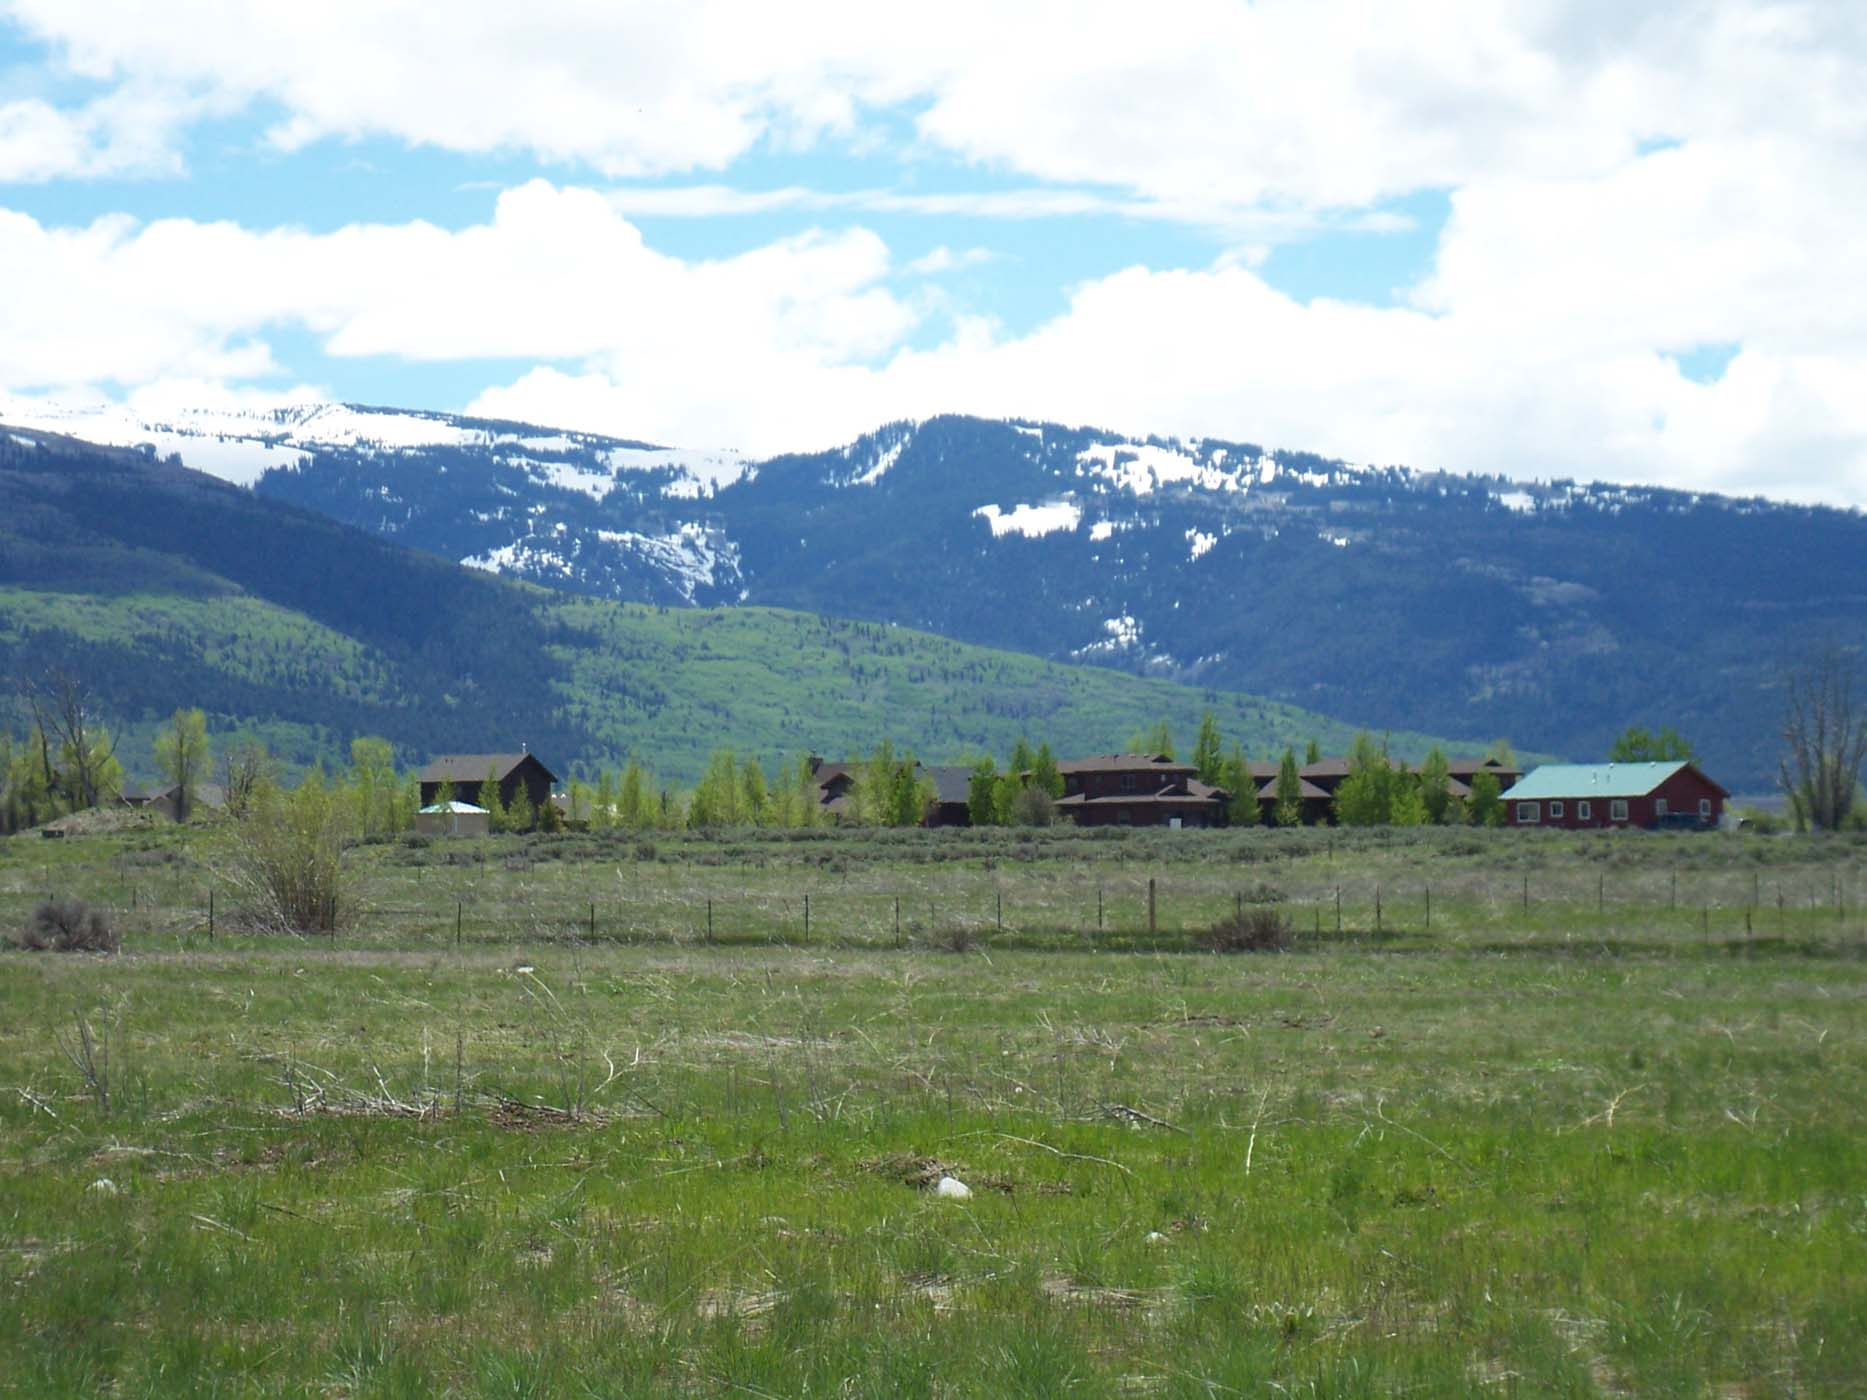 Земля для того Продажа на 20 acres Near Driggs Schools Approximately 155 Le Grand Pierre Ave. Driggs, Айдахо, 83422 Jackson Hole, Соединенные Штаты